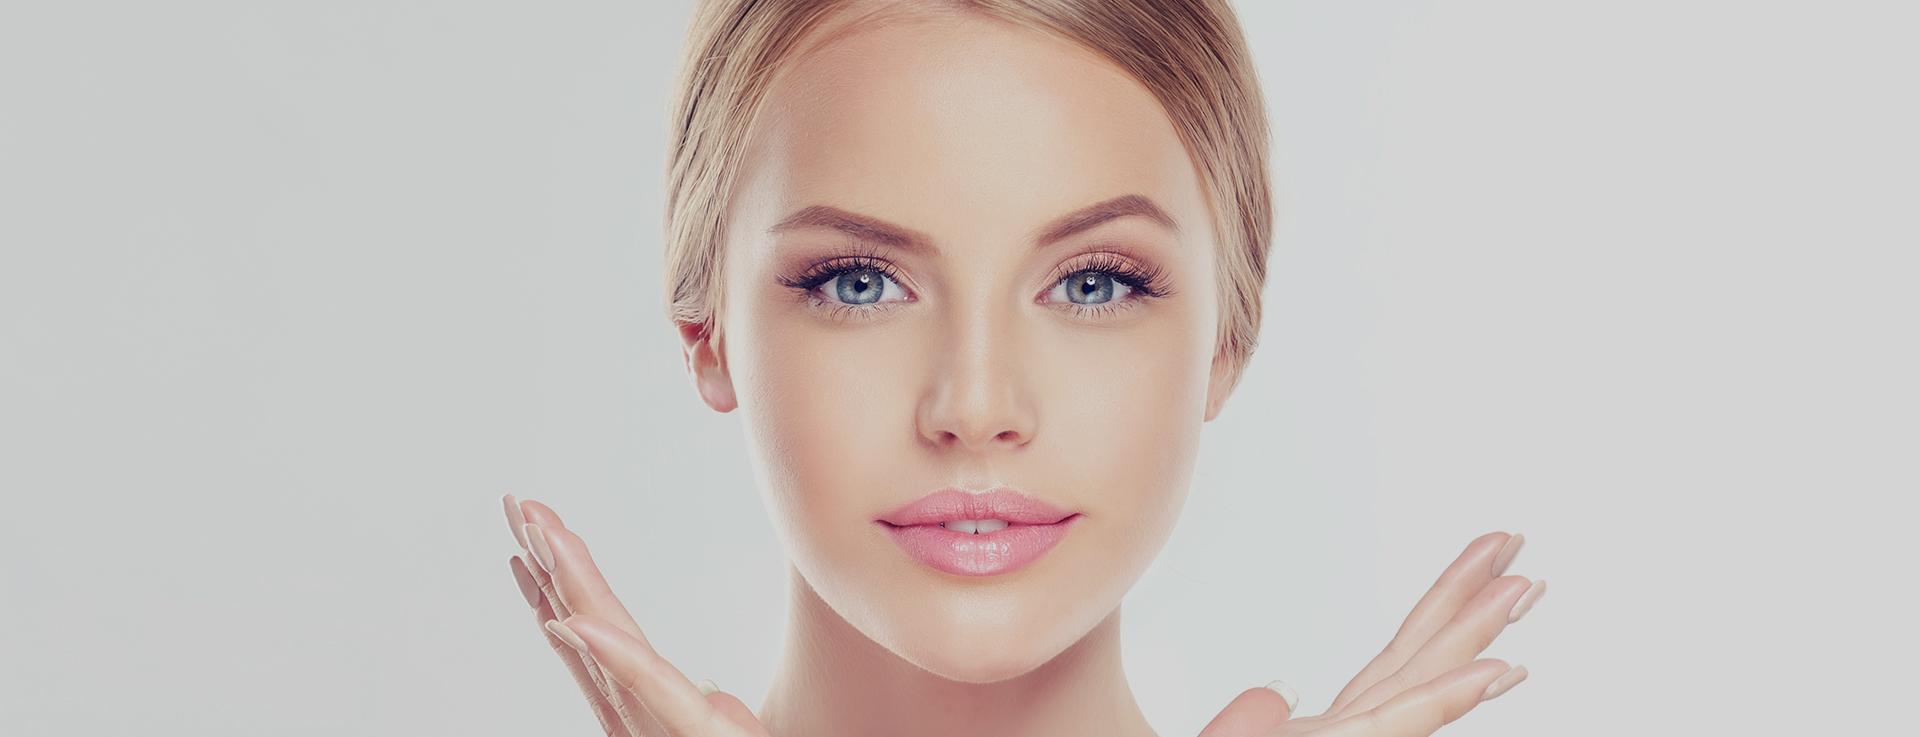 Total Skin Rejuvenation